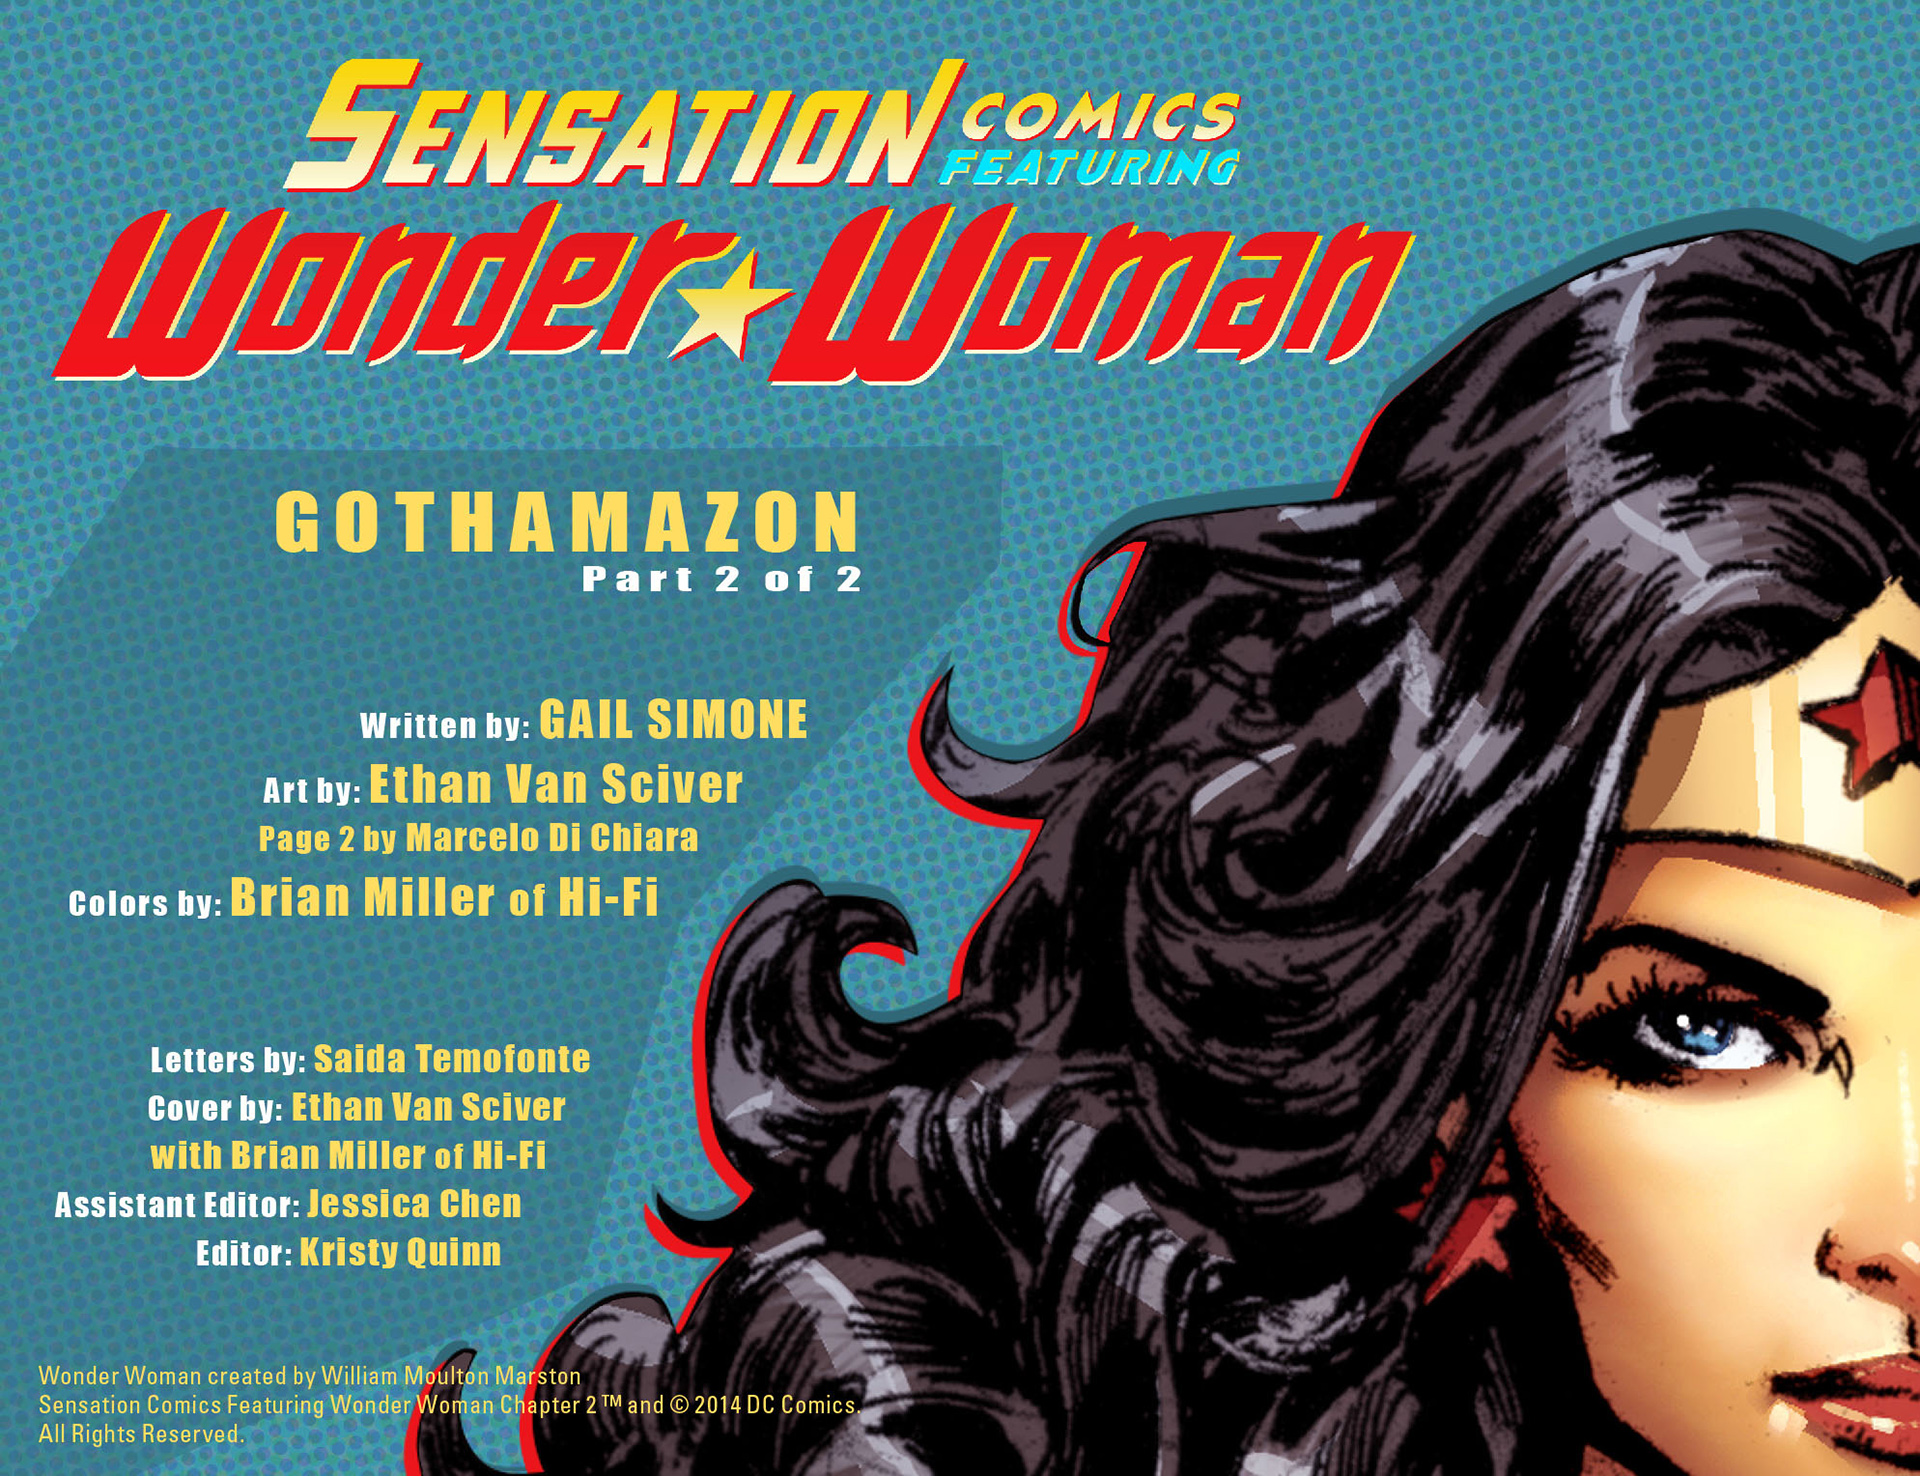 Read online Sensation Comics Featuring Wonder Woman comic -  Issue #2 - 2